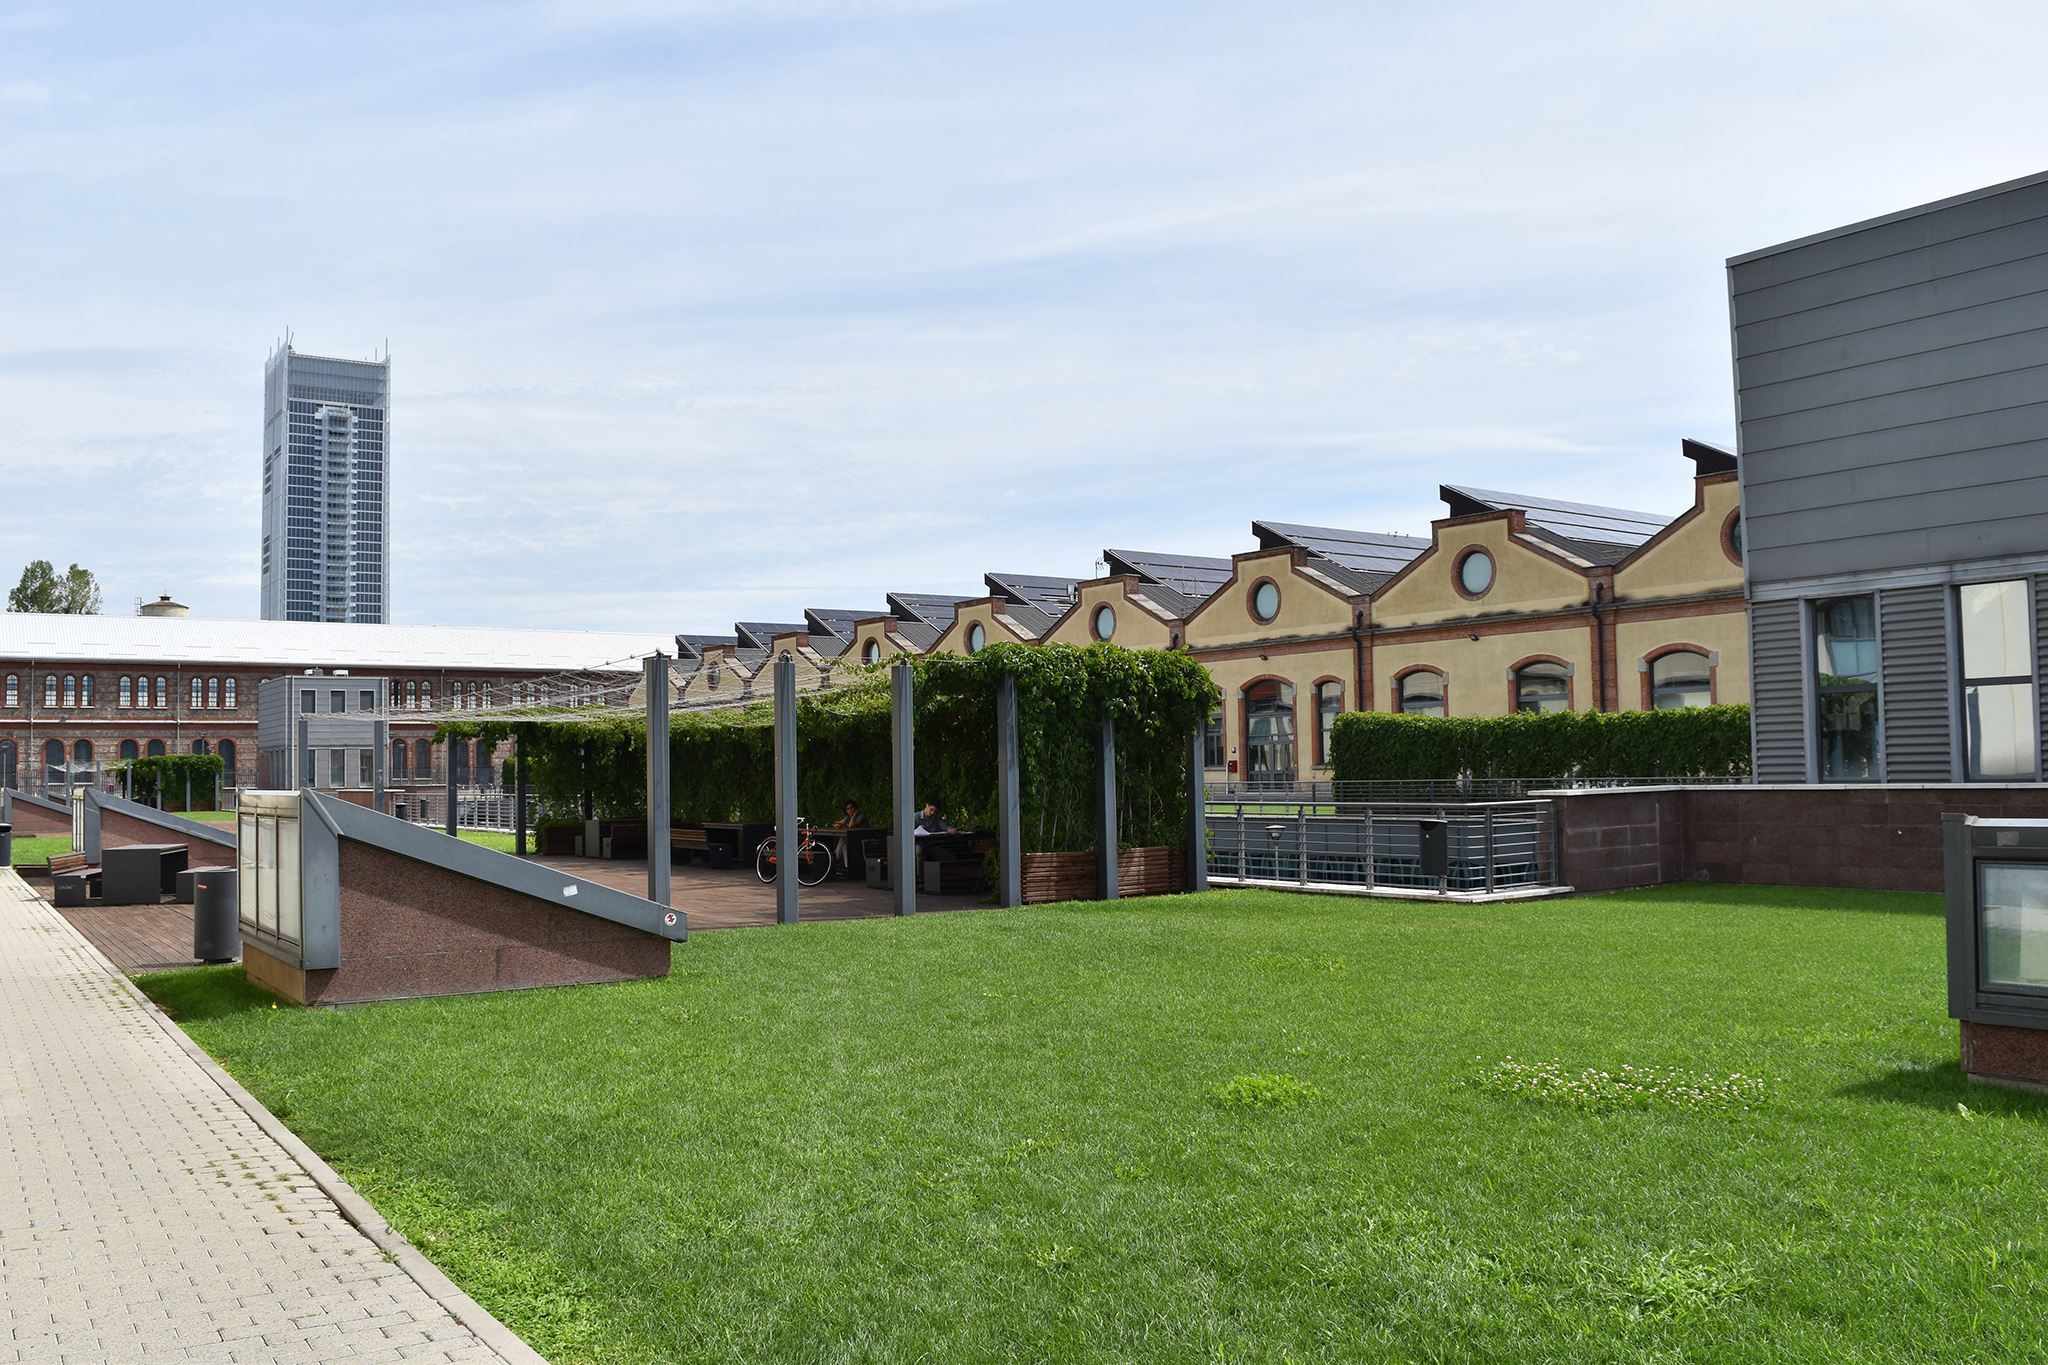 Polytechnic of Torino - Polito Campus